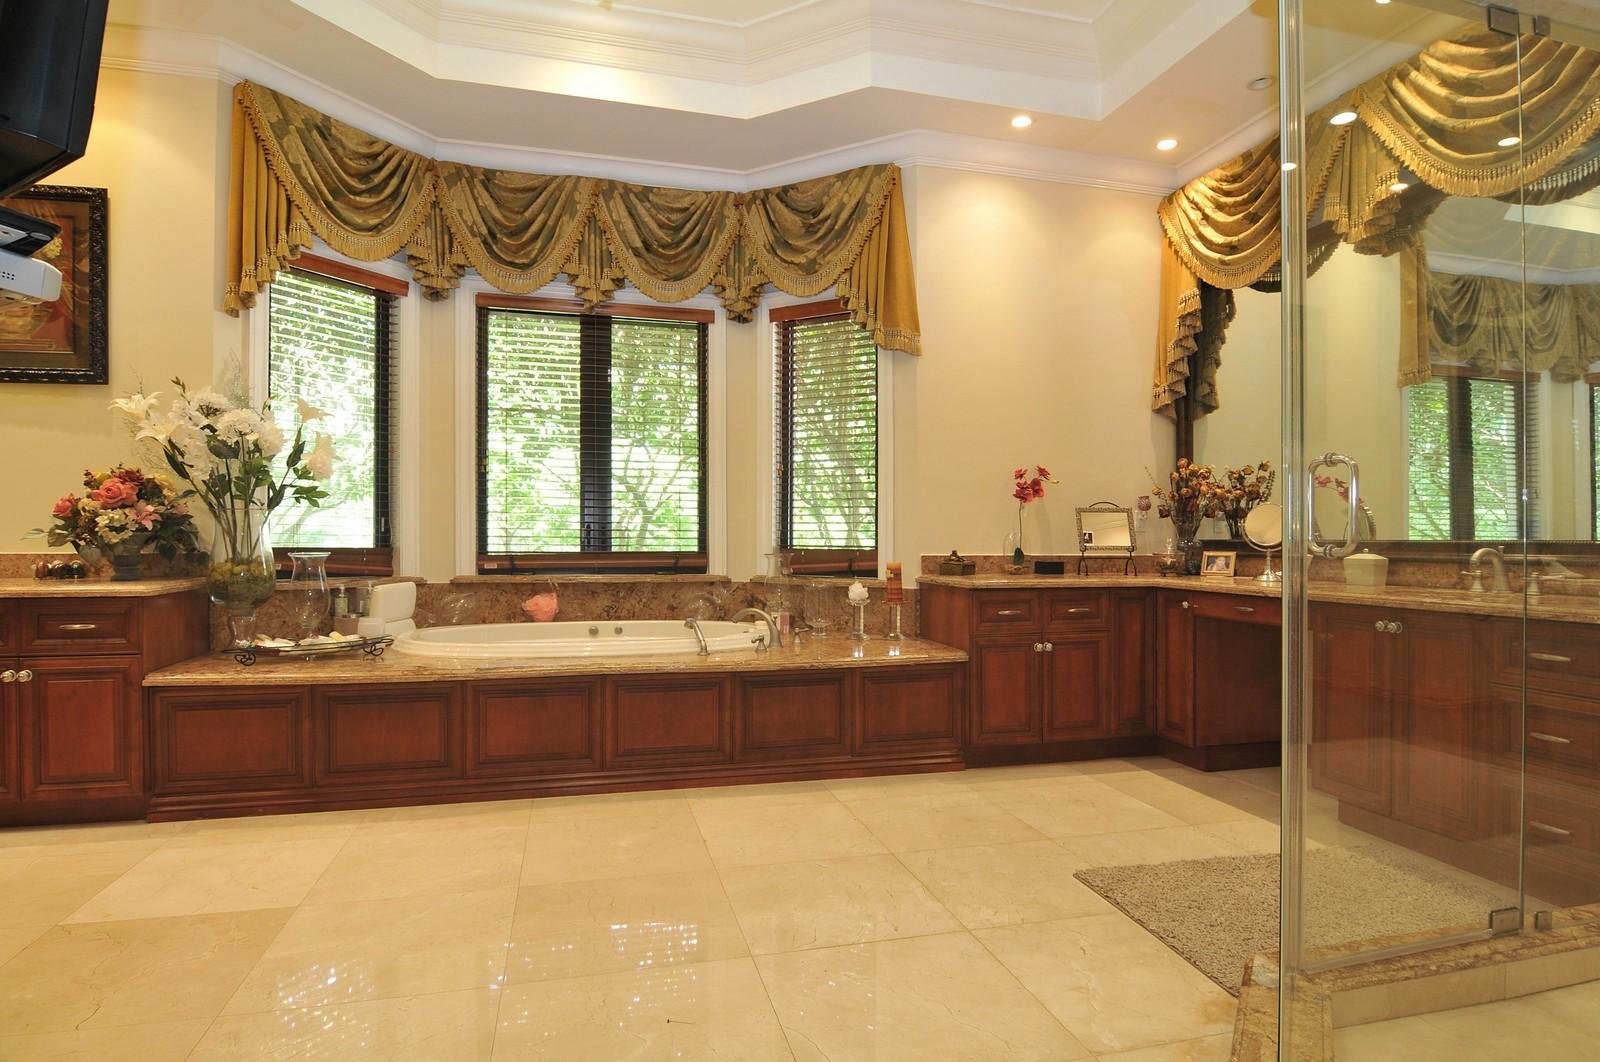 Real Estate Photography - 6270 SW 121st St, Pinecrest, FL, 33156 - Master Bathroom